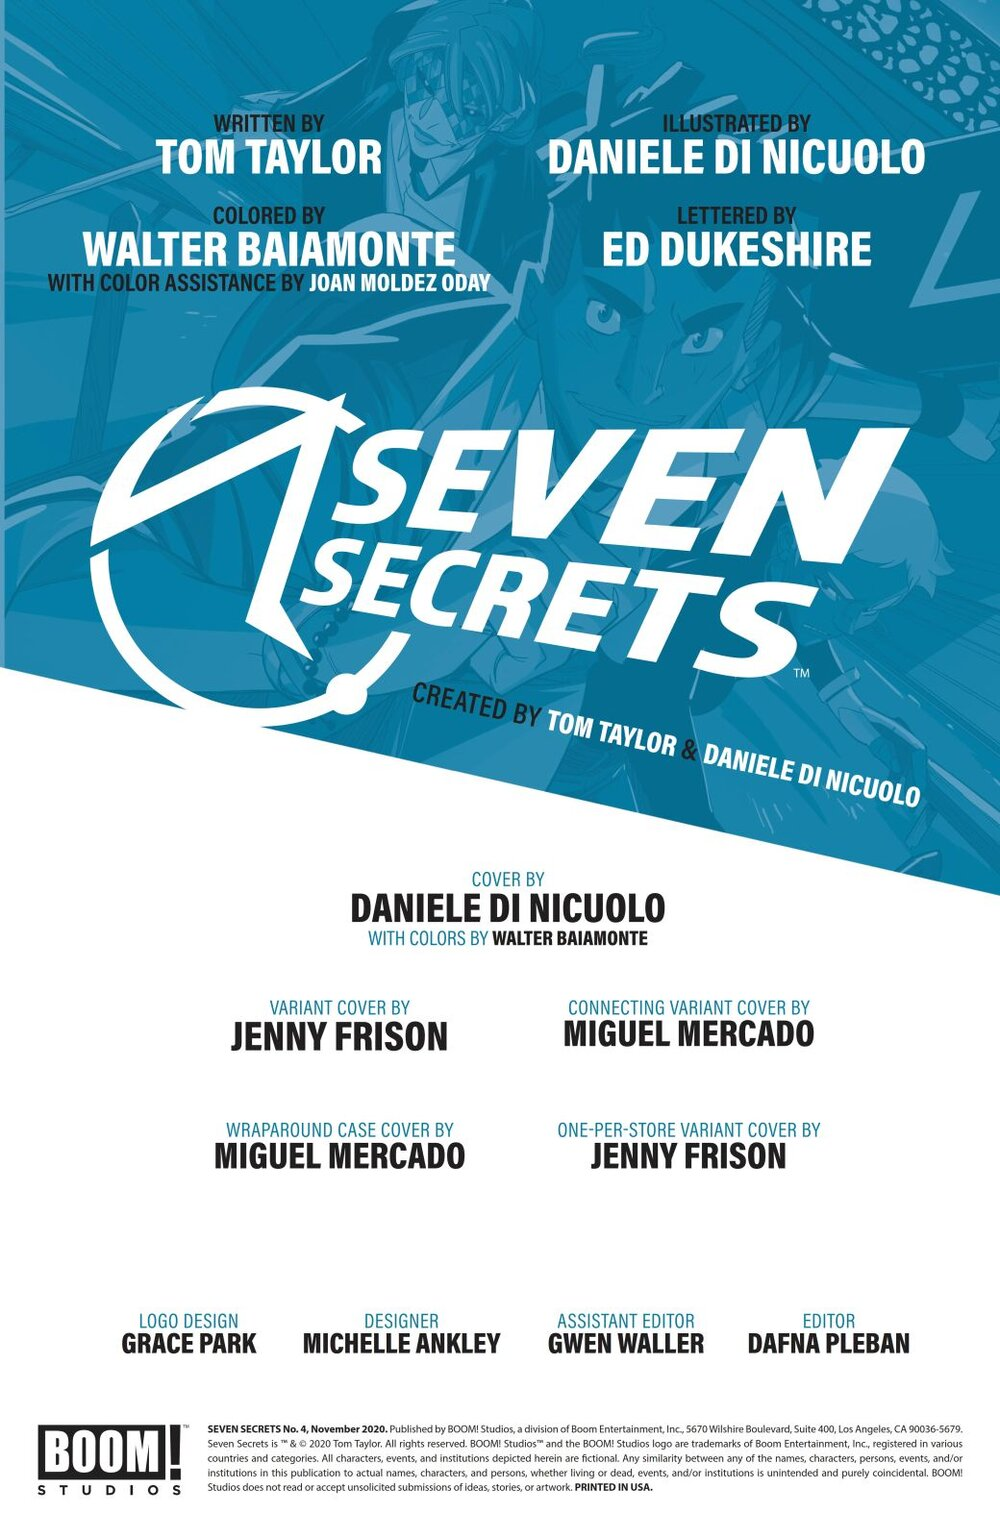 SevenSecrets_004_PRESS_2.jpg